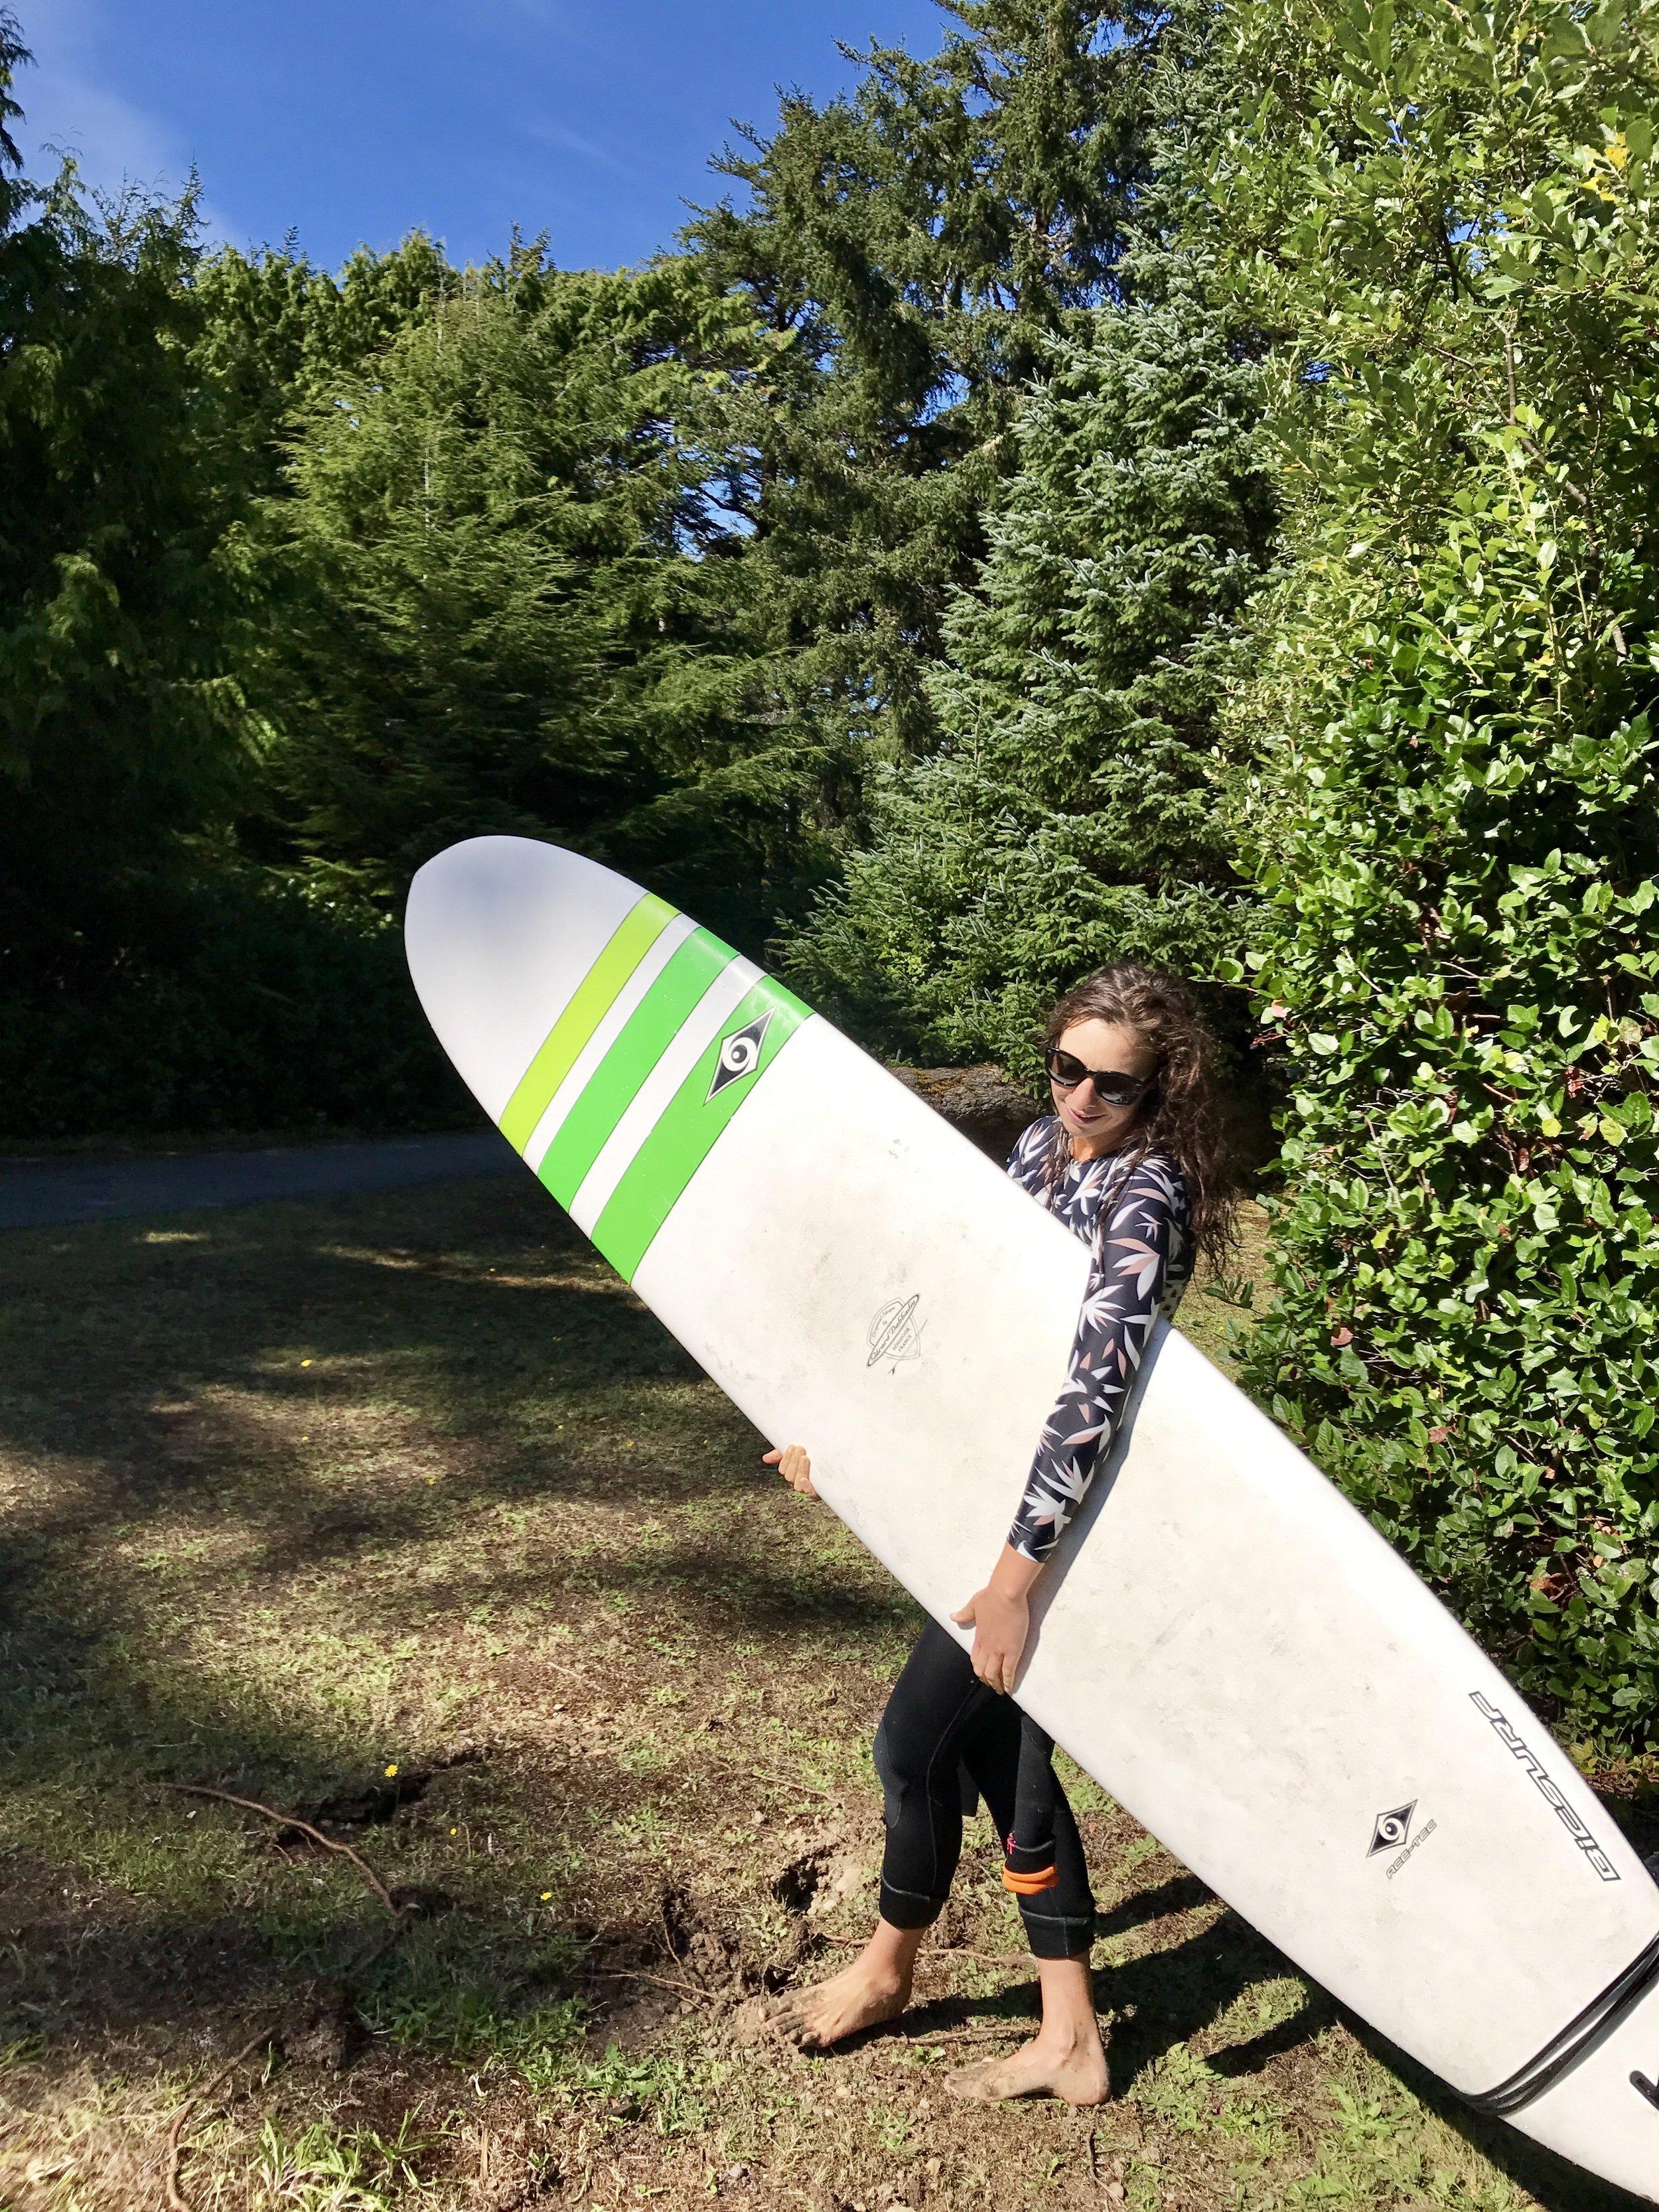 Suring in Tofino - Longboarding Summer 2017